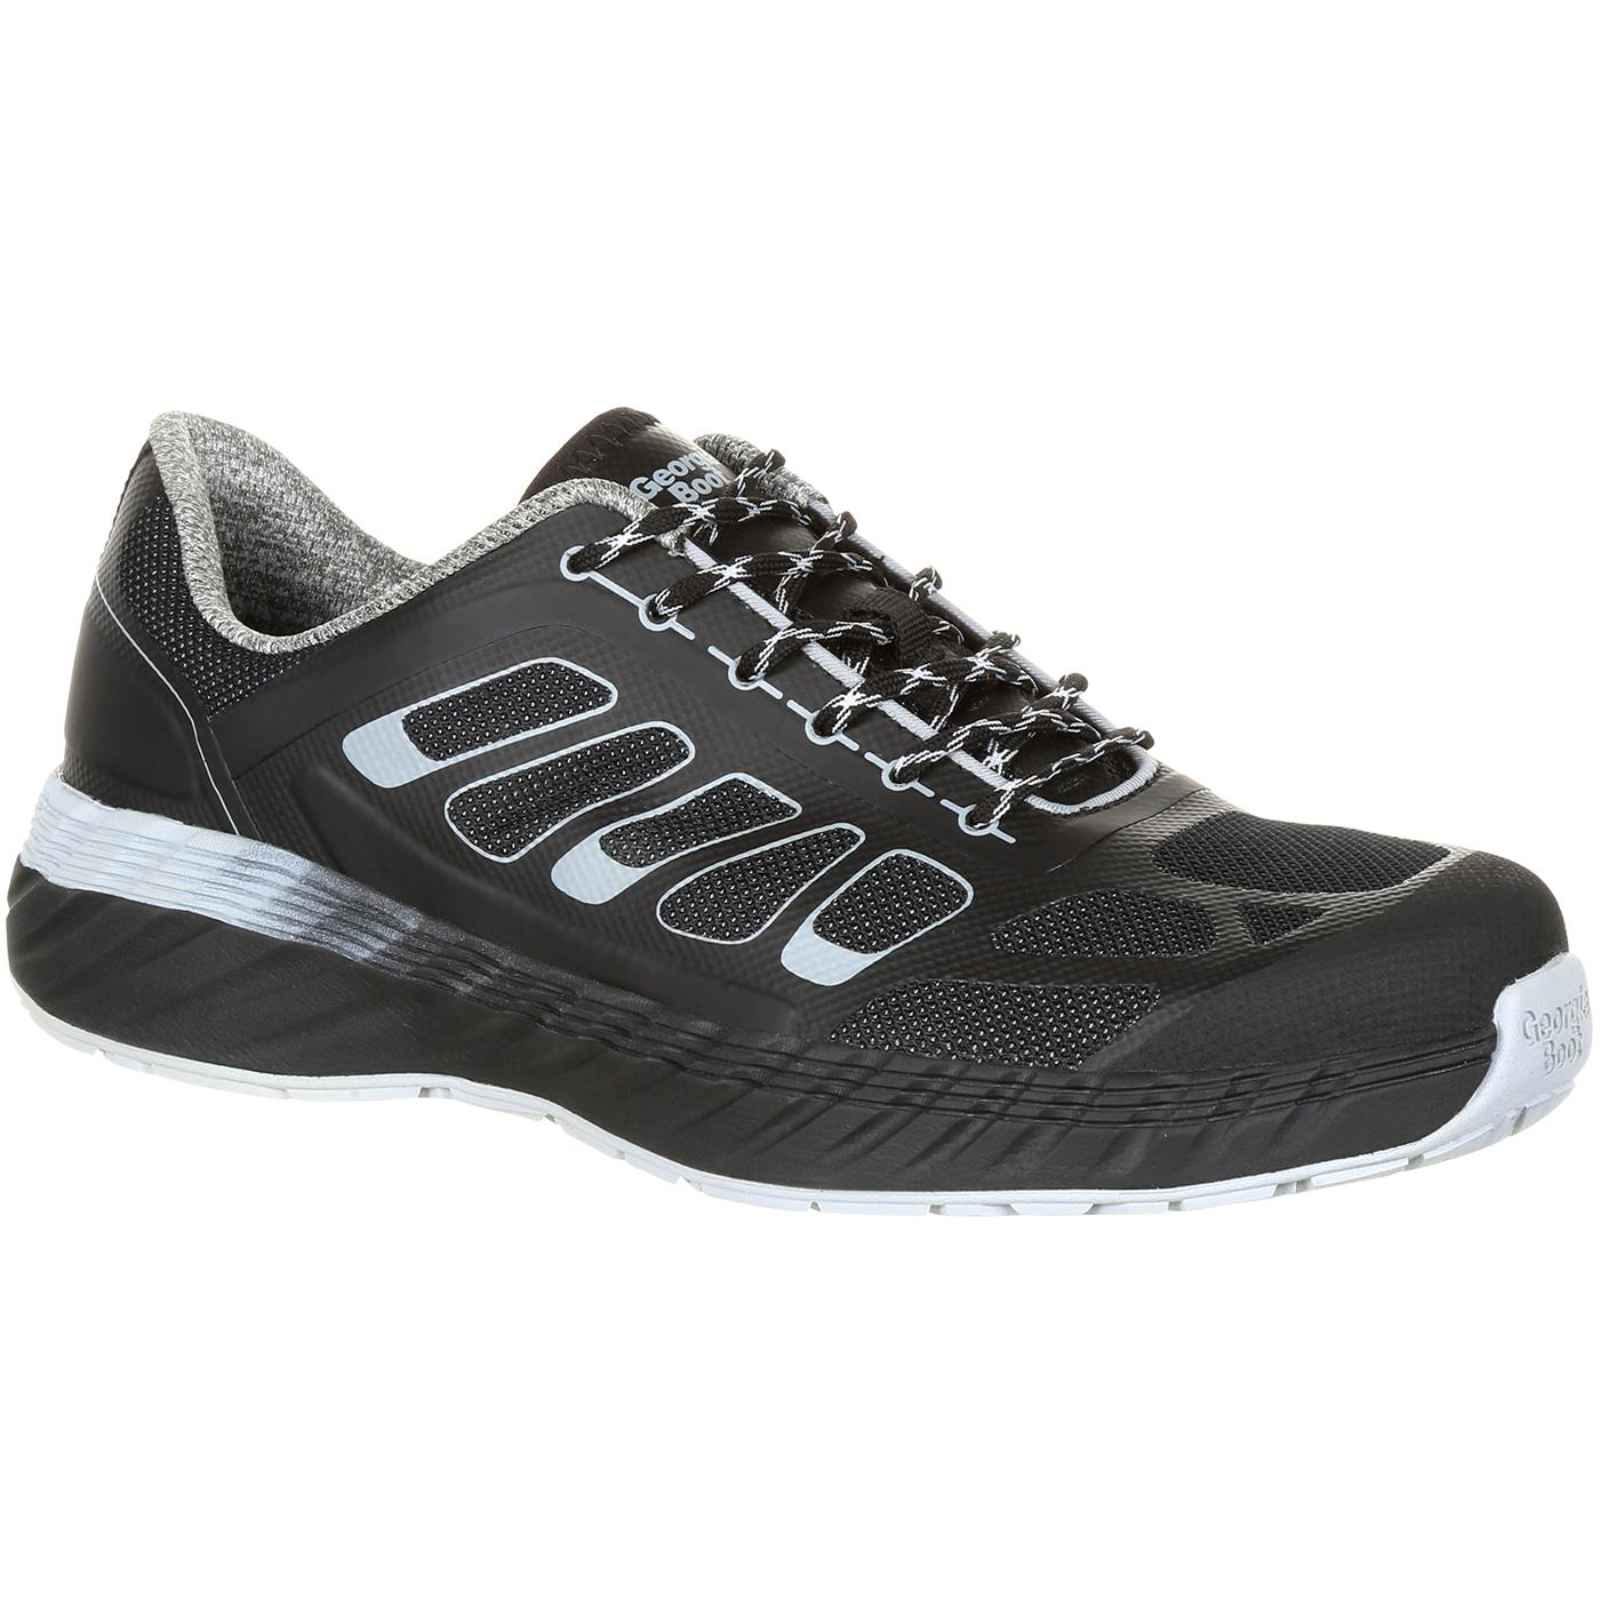 Georgia Boot Men's Black and White ReFLX Alloy Toe Athletic Work Shoe GB00218 by Georgia